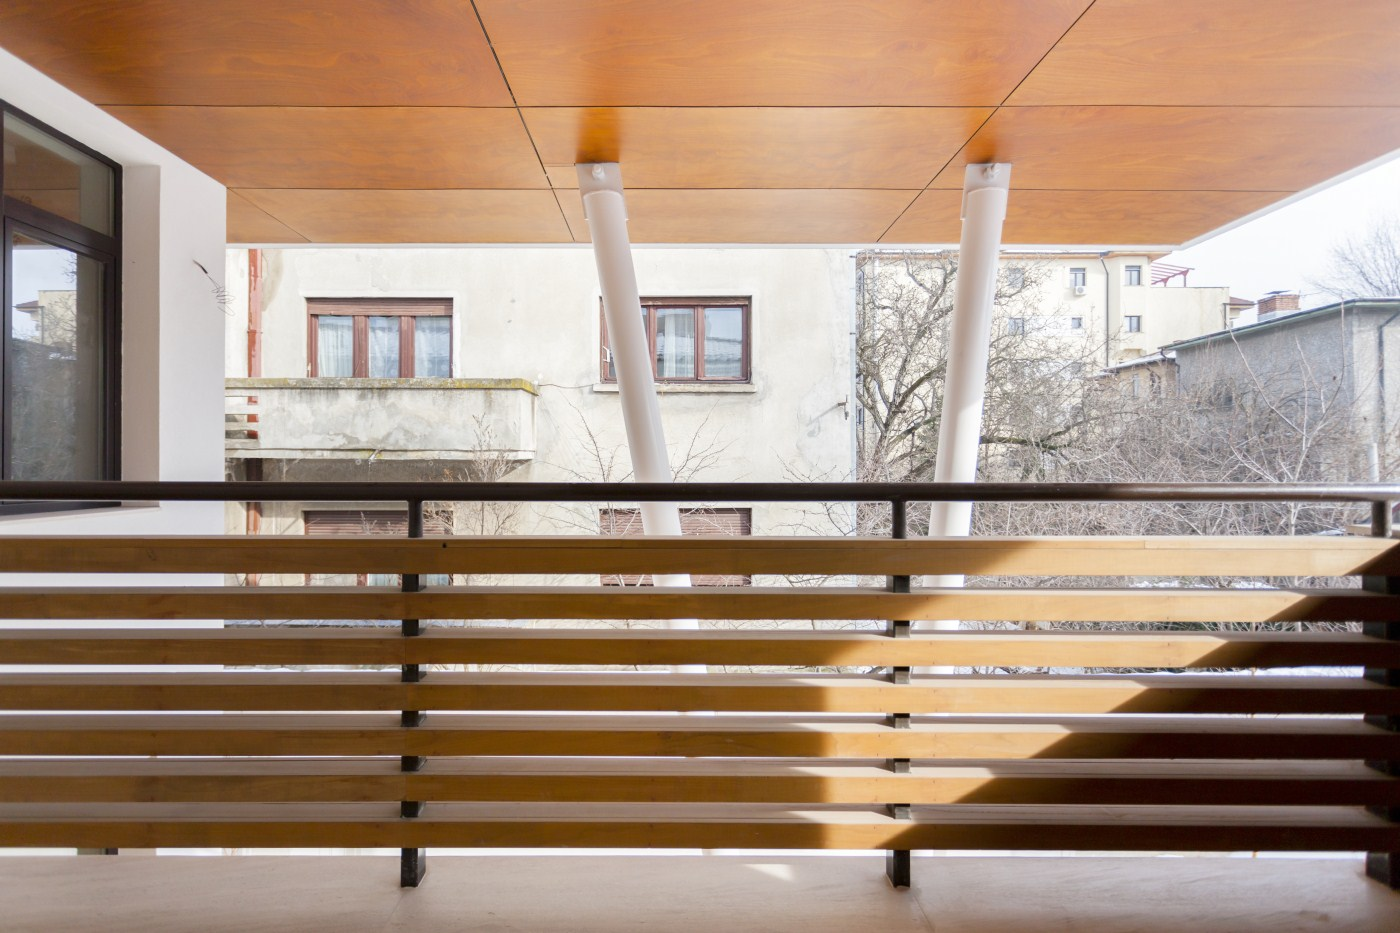 https://nbc-arhitect.ro/wp-content/uploads/2020/10/NBC-ARHITECT-_-housing-_-Sandu-Aldea-House-Villa-_-exterior-view-_-terrace_2.jpg